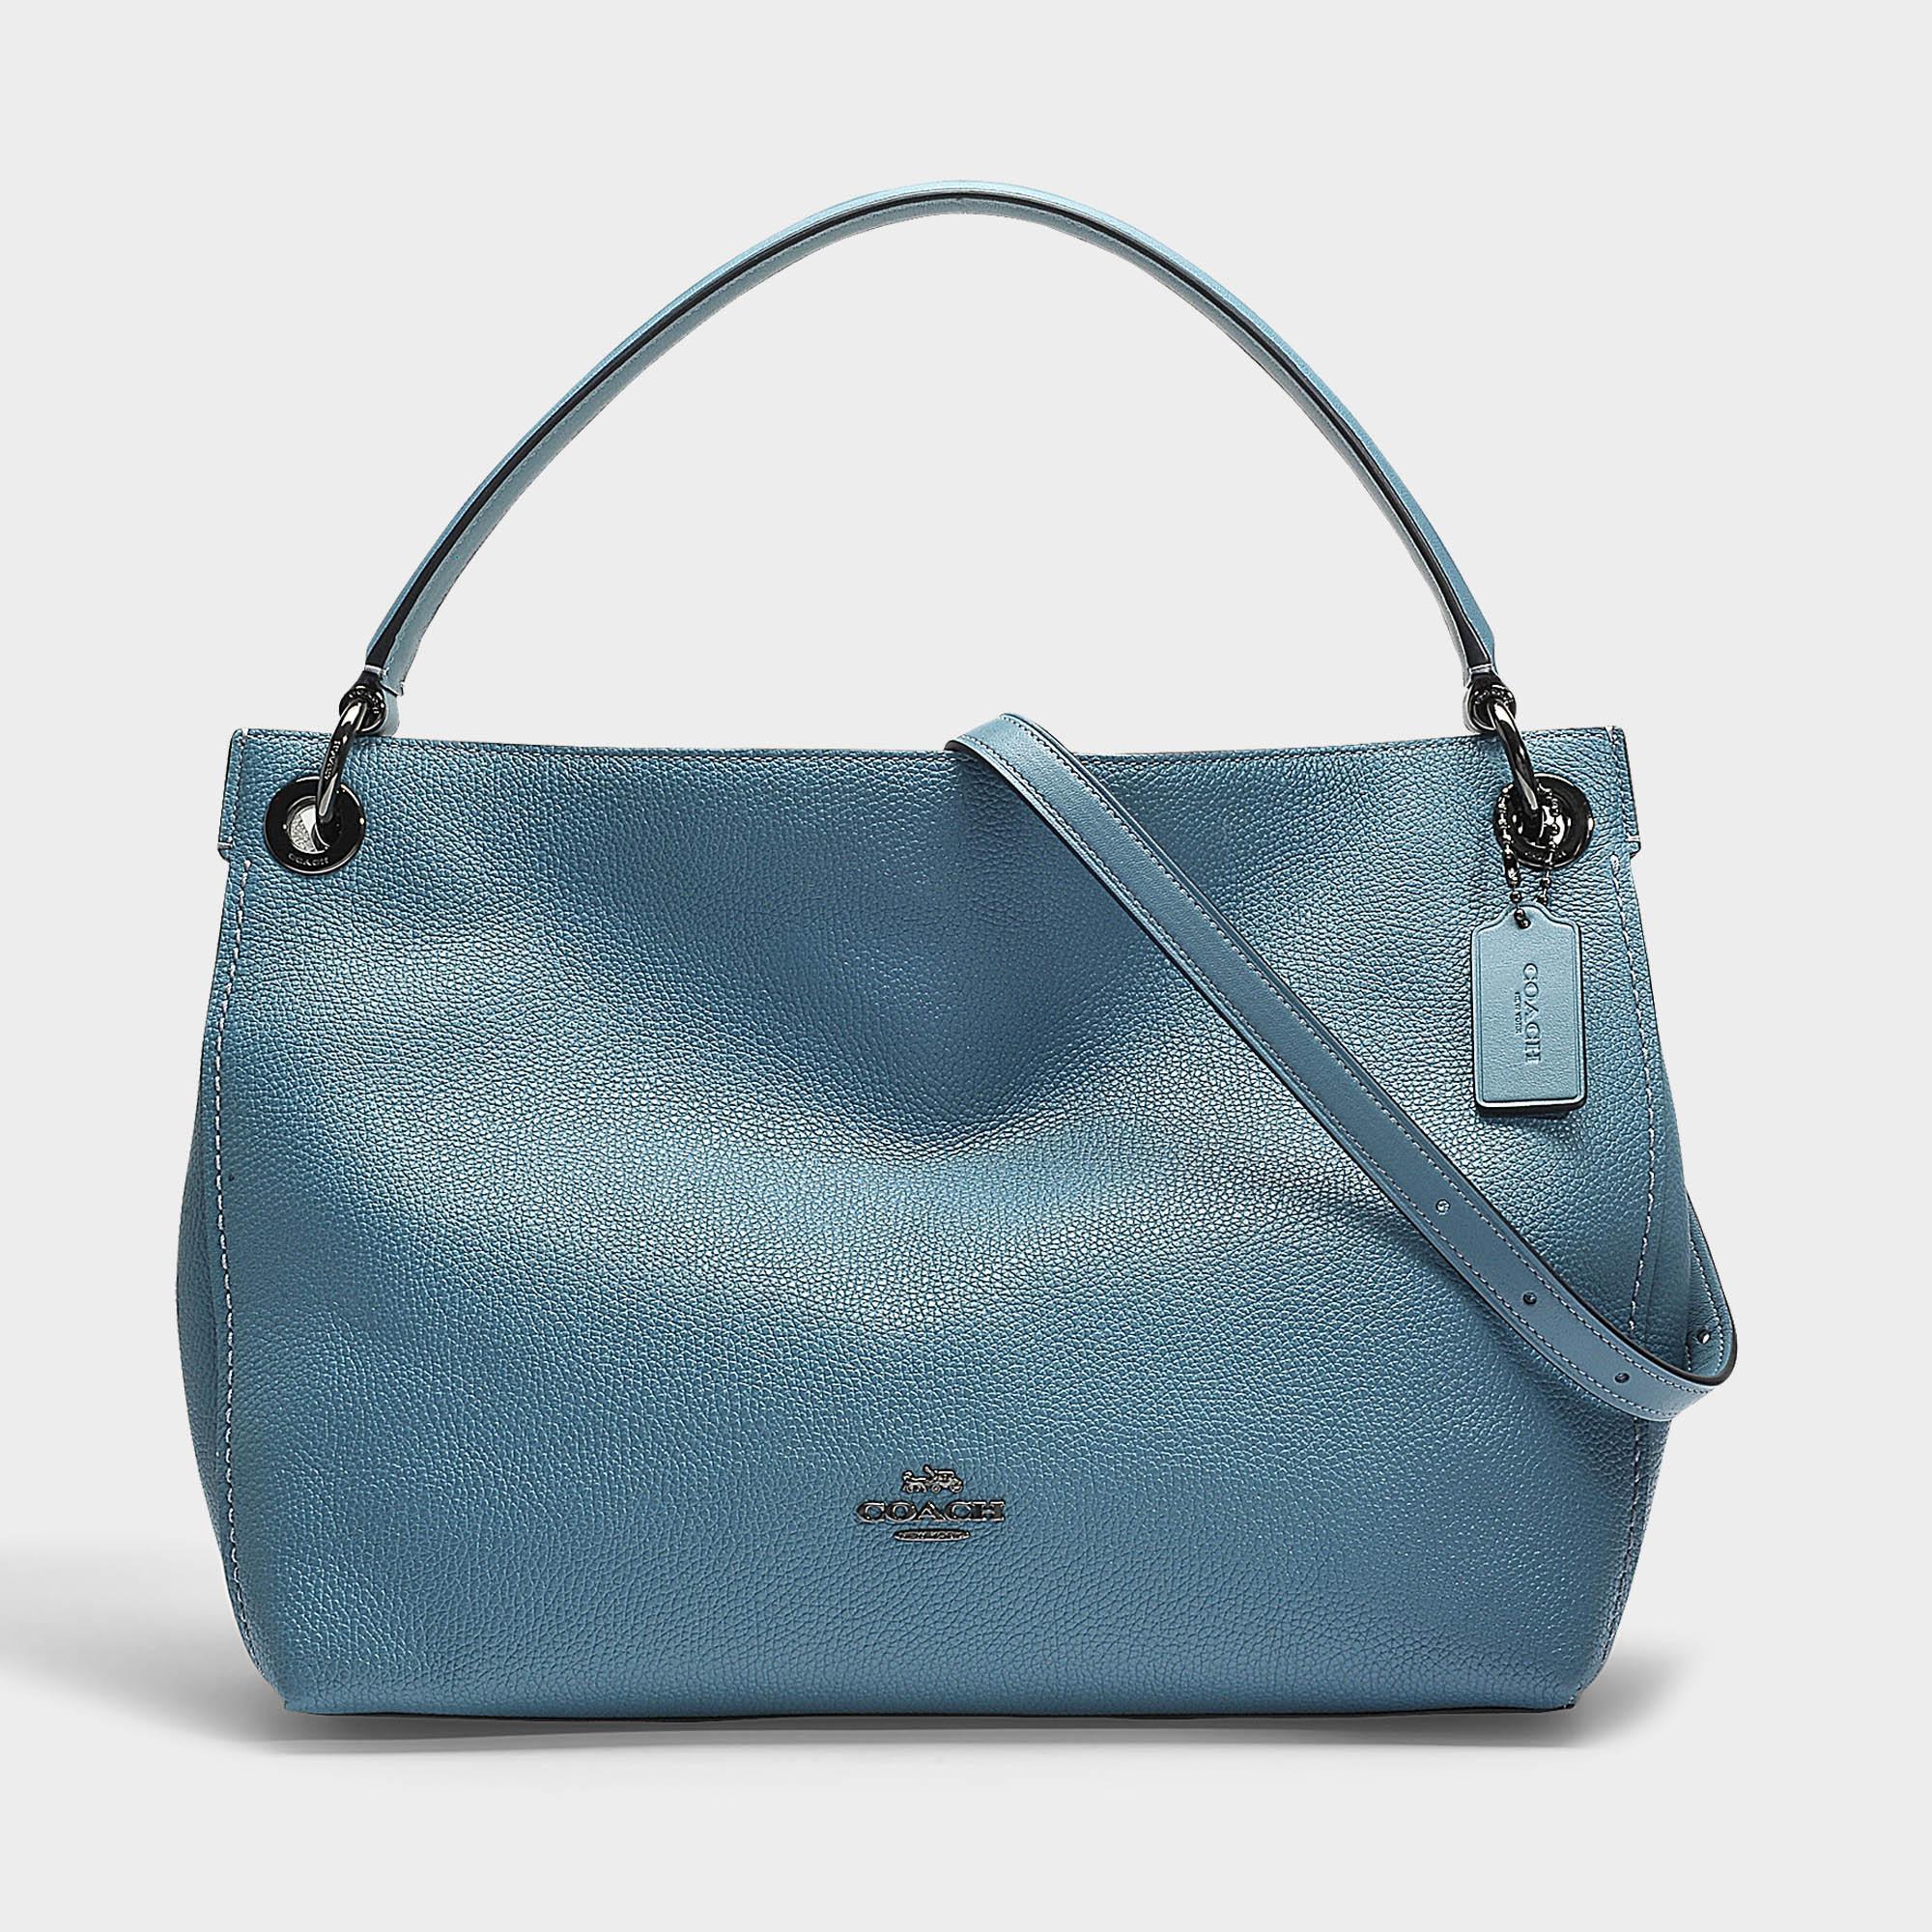 64e3dfb55fbf COACH Clarkson Hobo Bag In Chambray Calfskin in Blue - Lyst